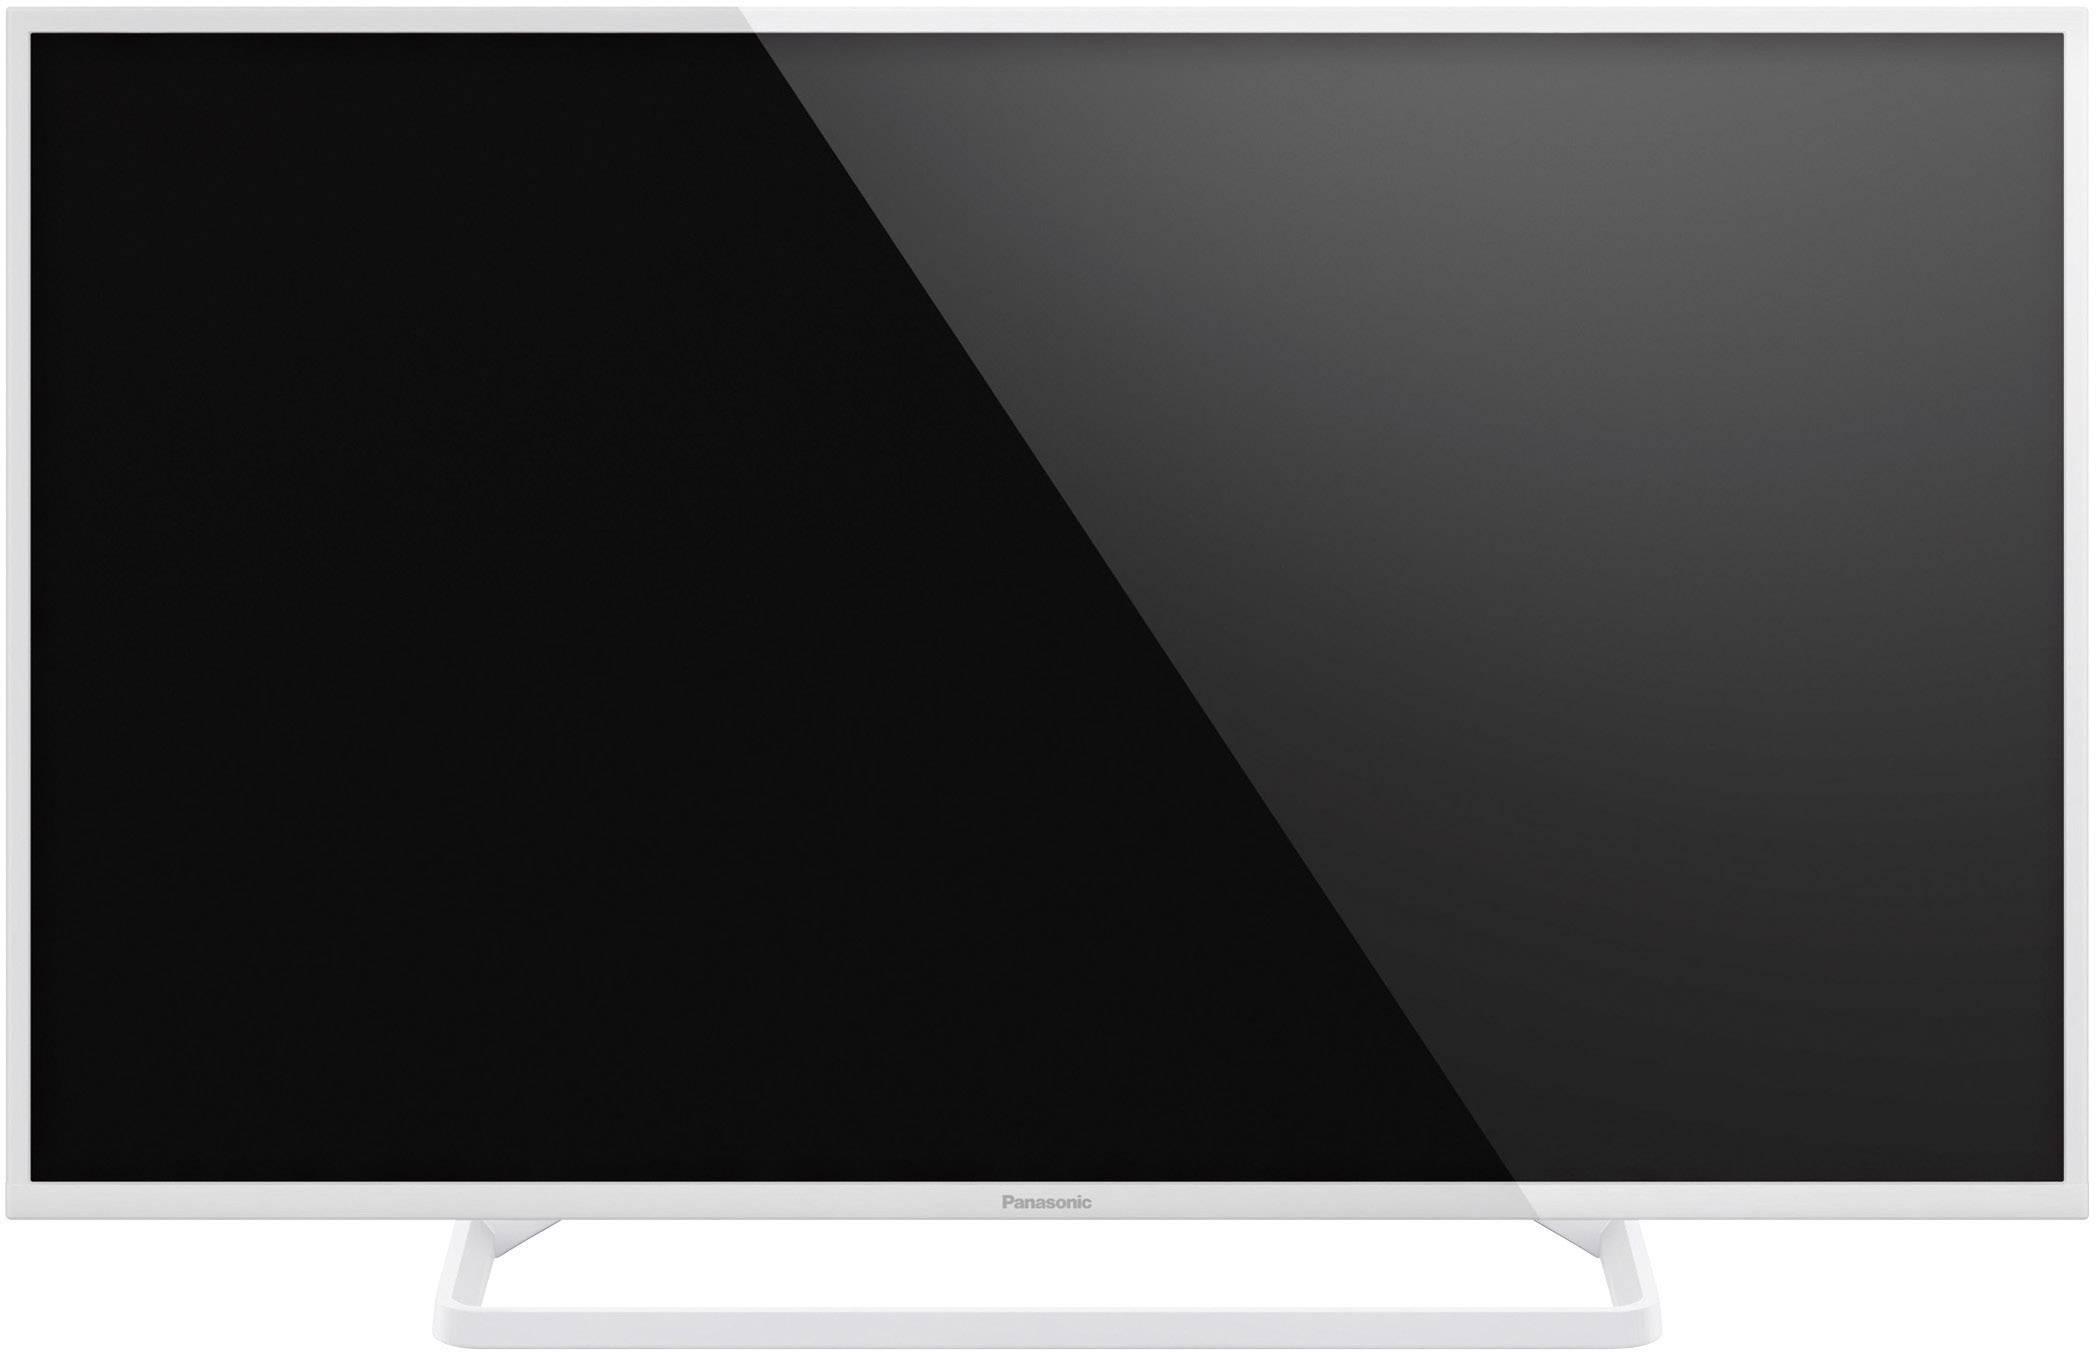 panasonic tx 42asw604w led tv 105 cm 42 inch dvb t dvb c dvb s full hd smart tv wi fi pvr ready ci clean white